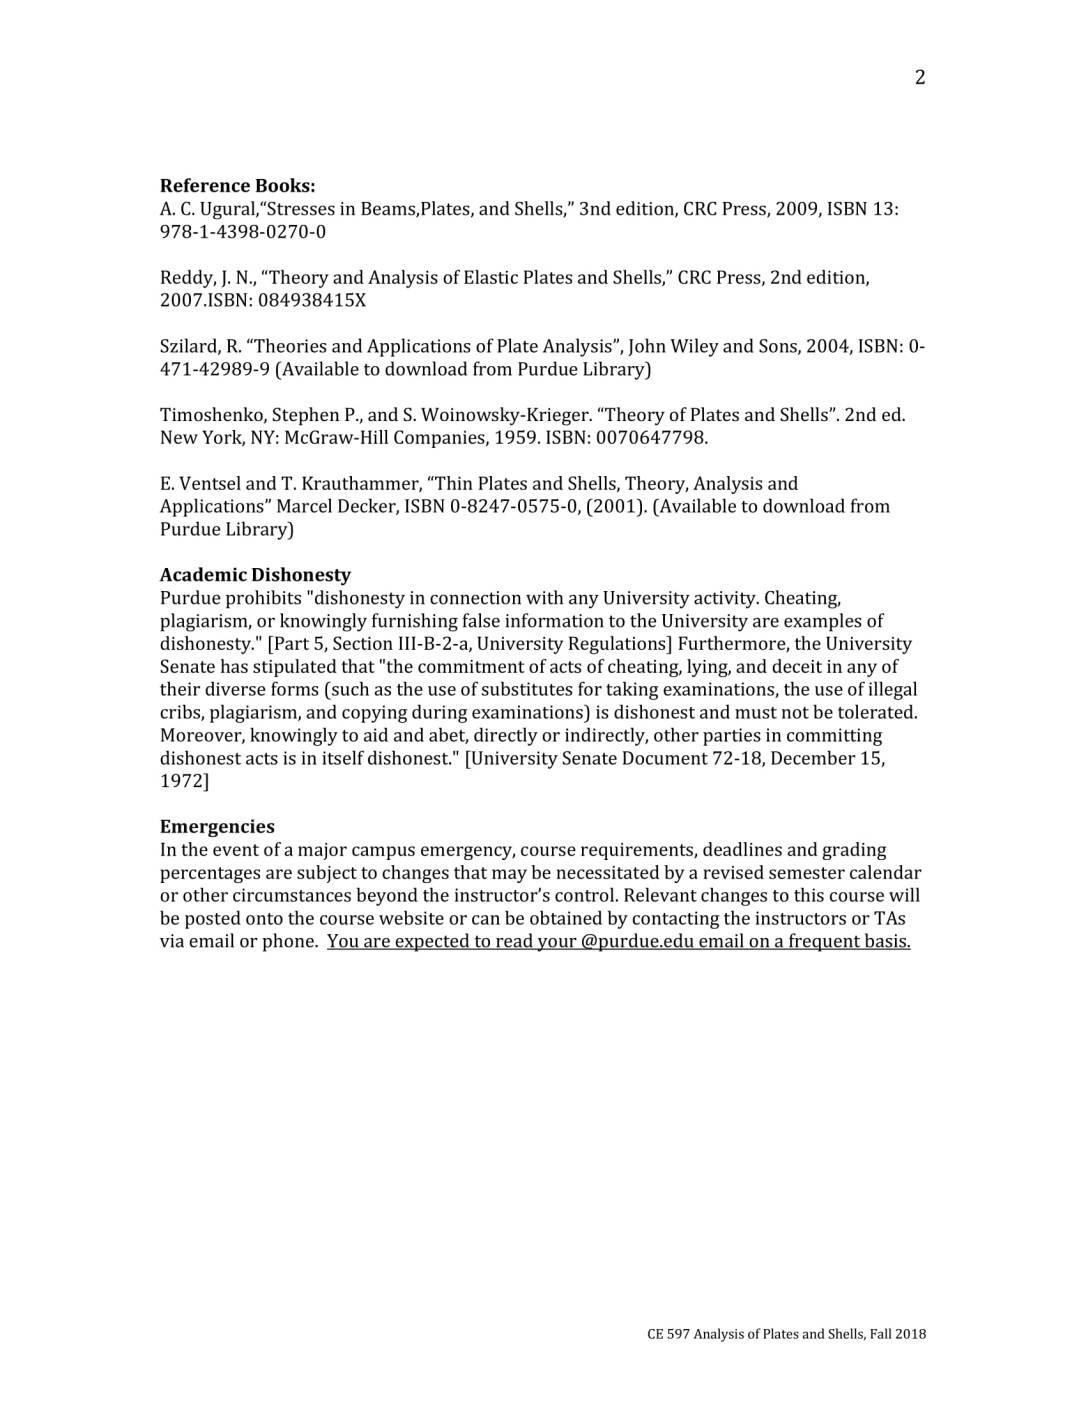 Syllabus_CE597 Analysis of Plates and Shells - Fall 2018-2